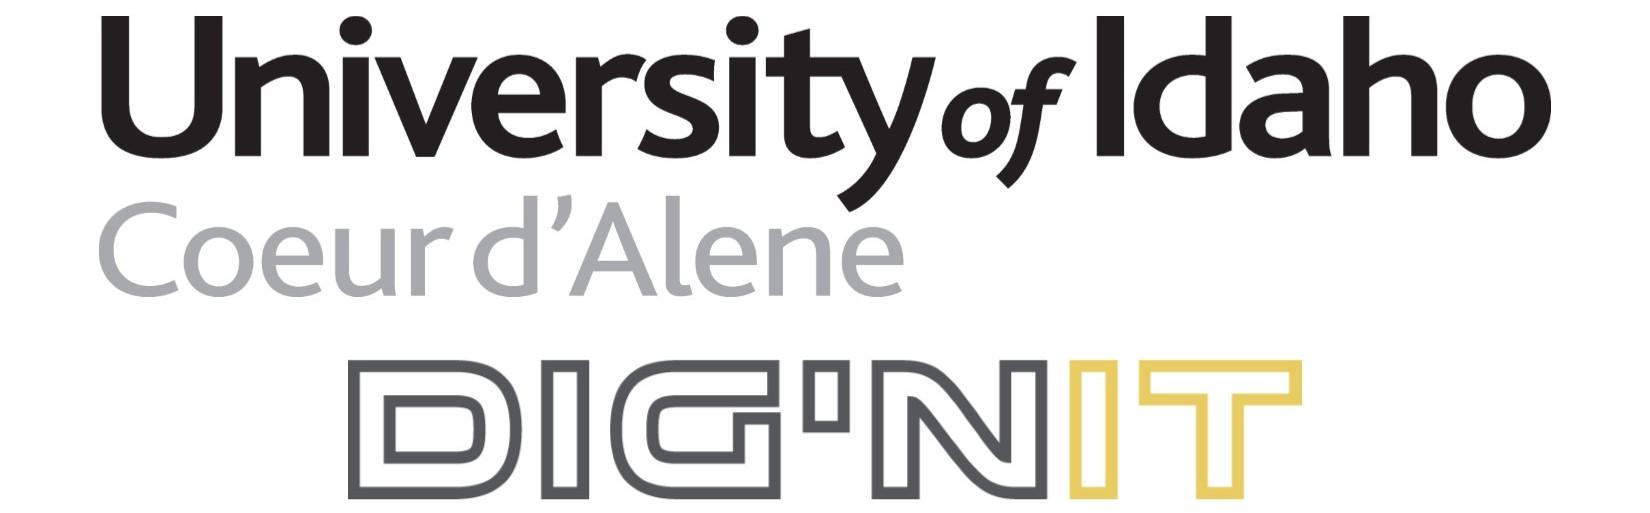 UI Dig'nIT logos